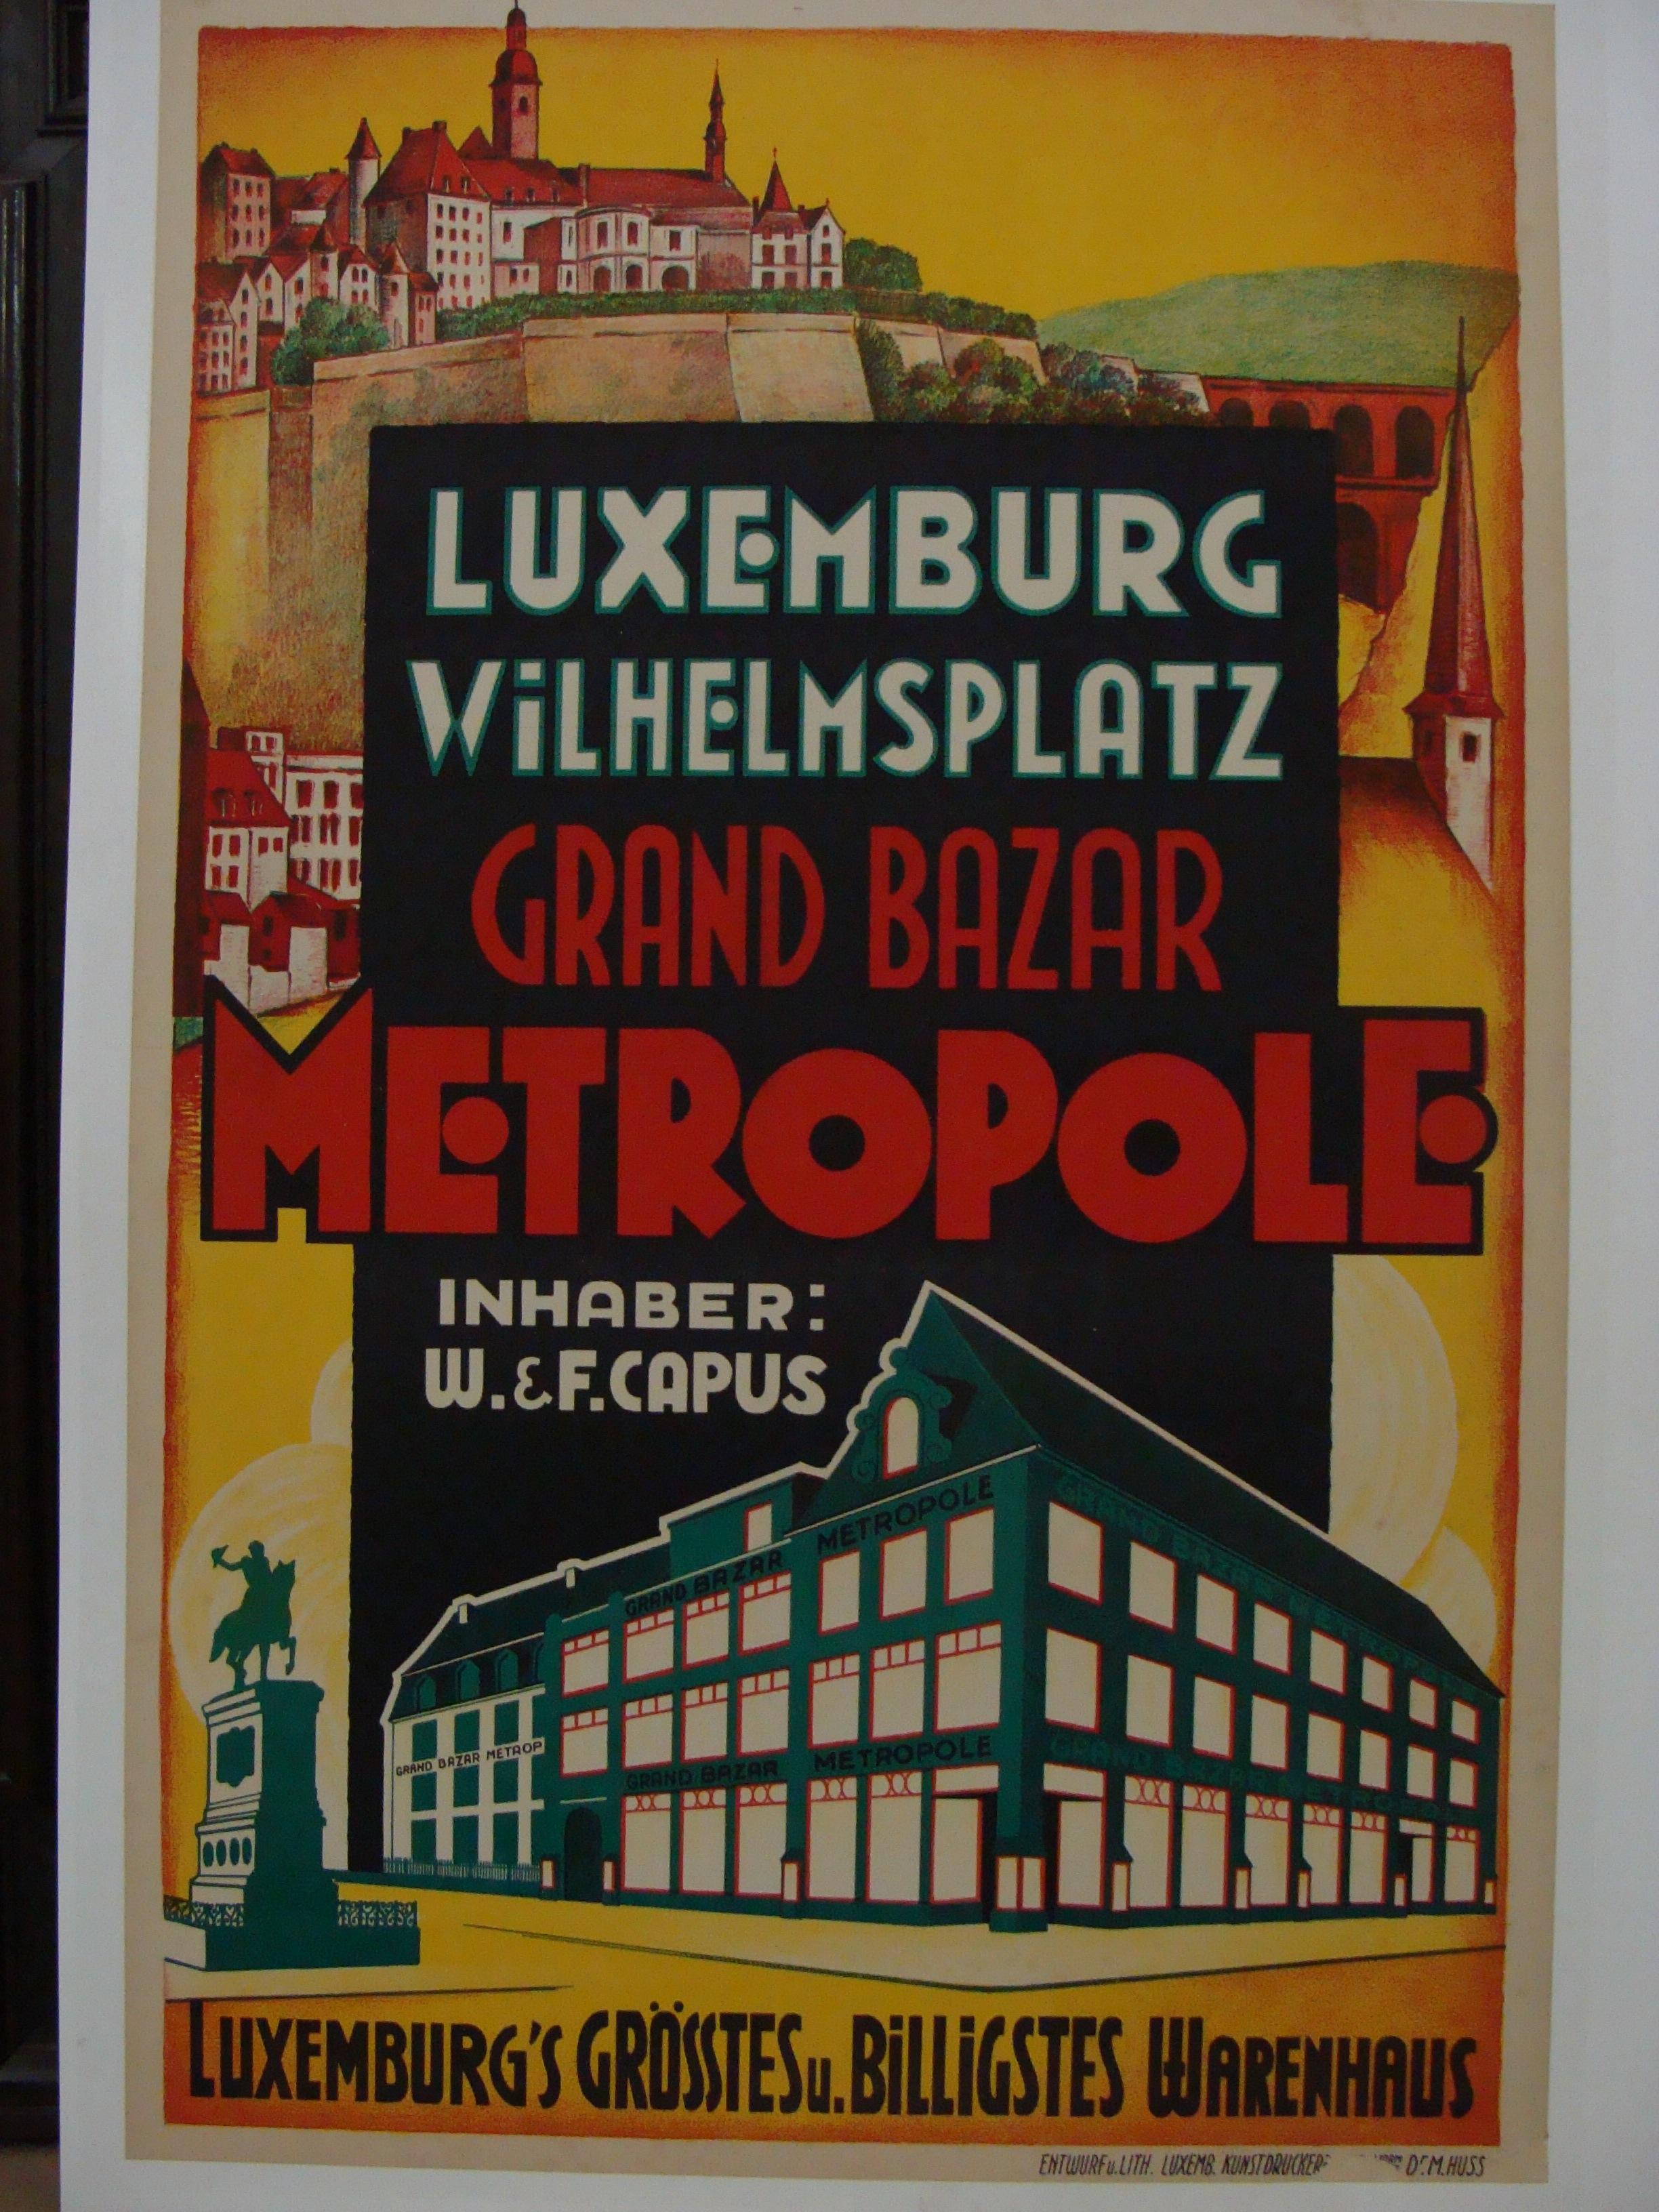 bazar metropol